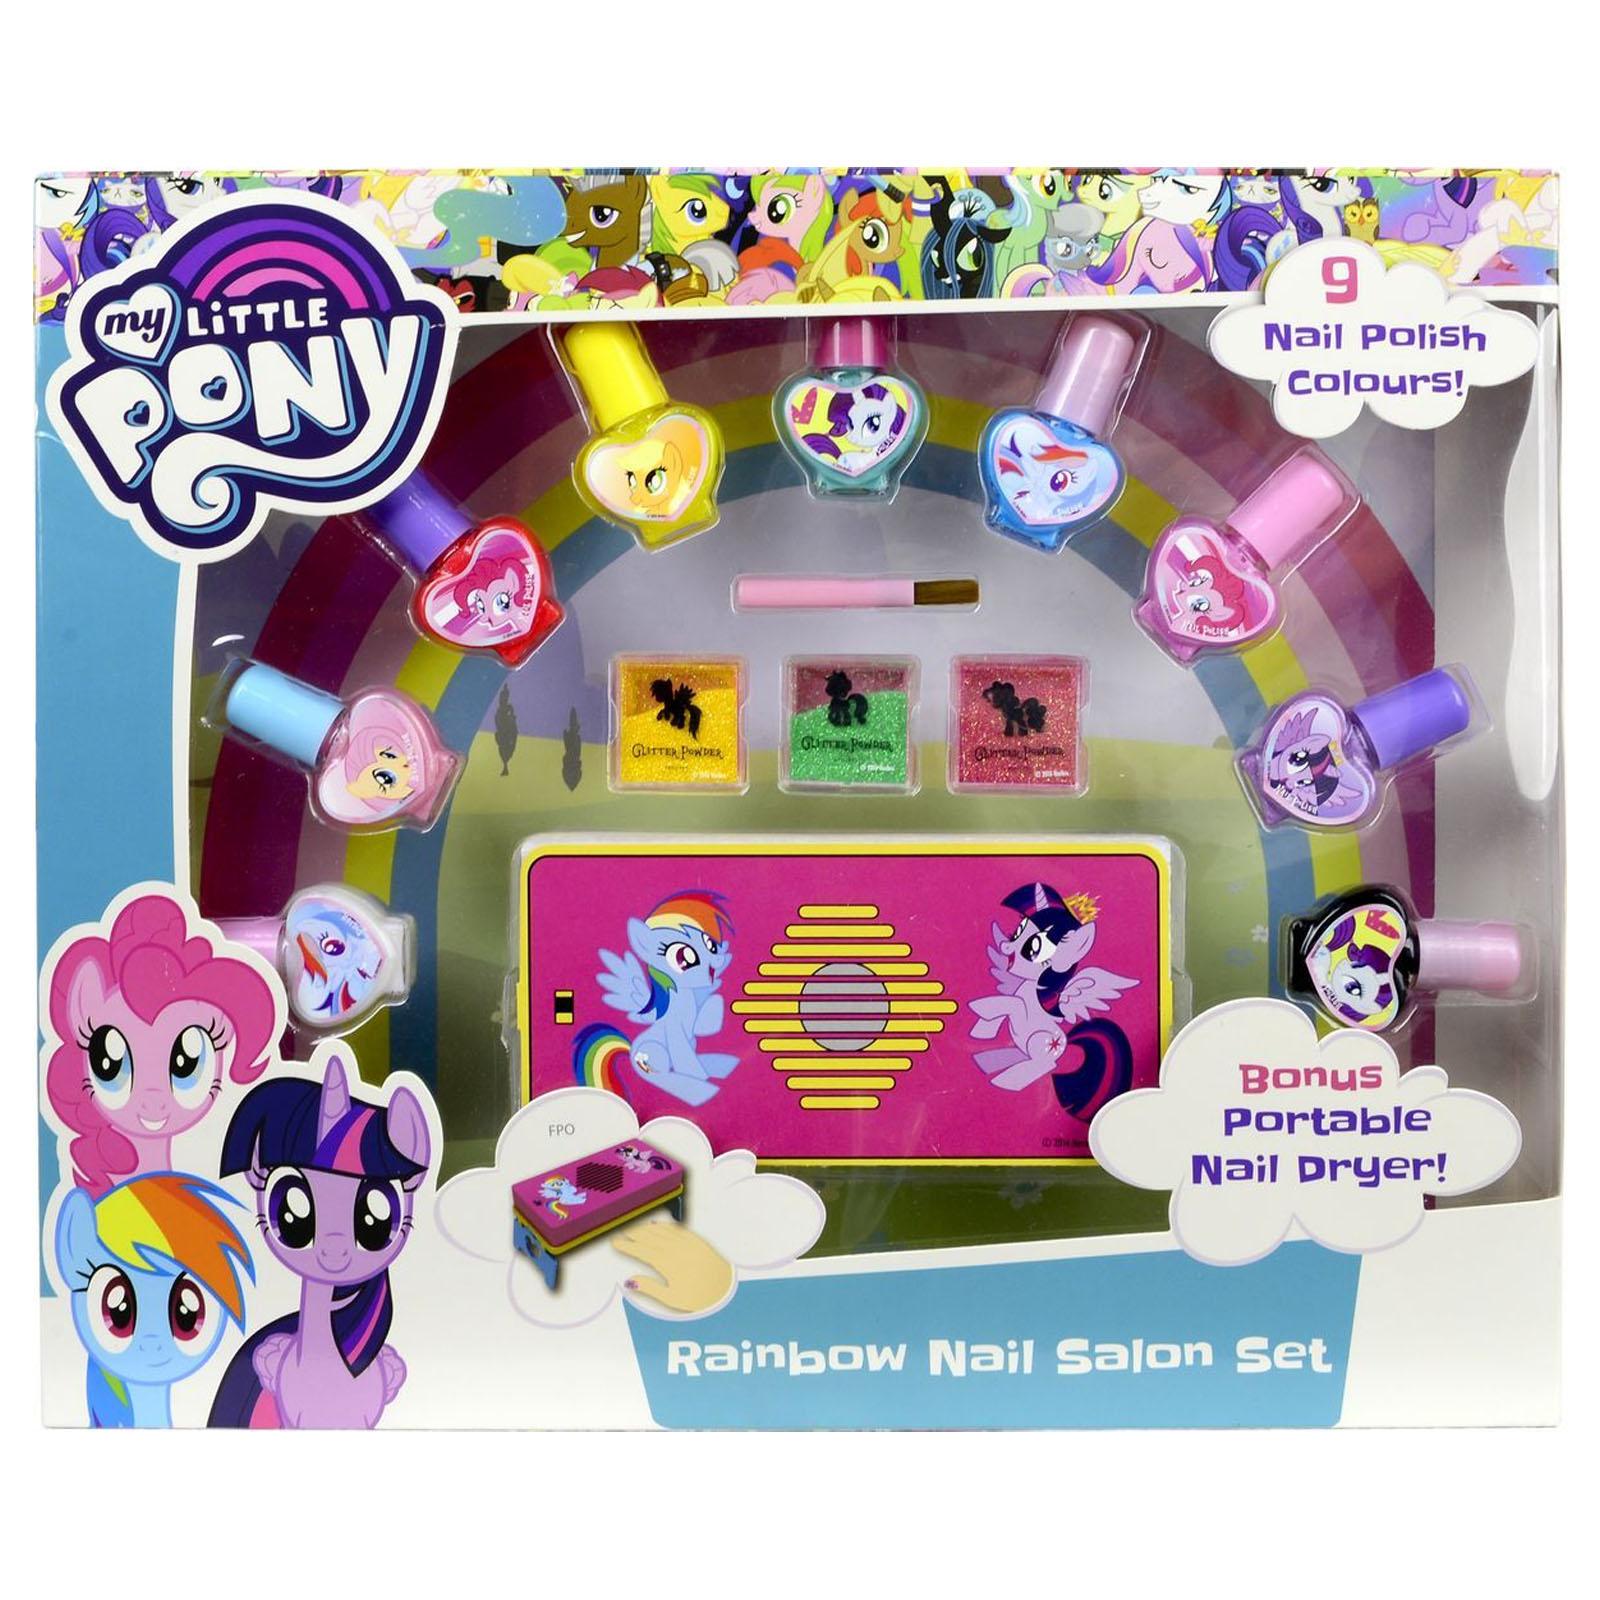 Декоративная косметика для ногтей Markwins My Little PonyДетская косметика Markwins<br>Декоративная косметика для ногтей Markwins My Little Pony<br>